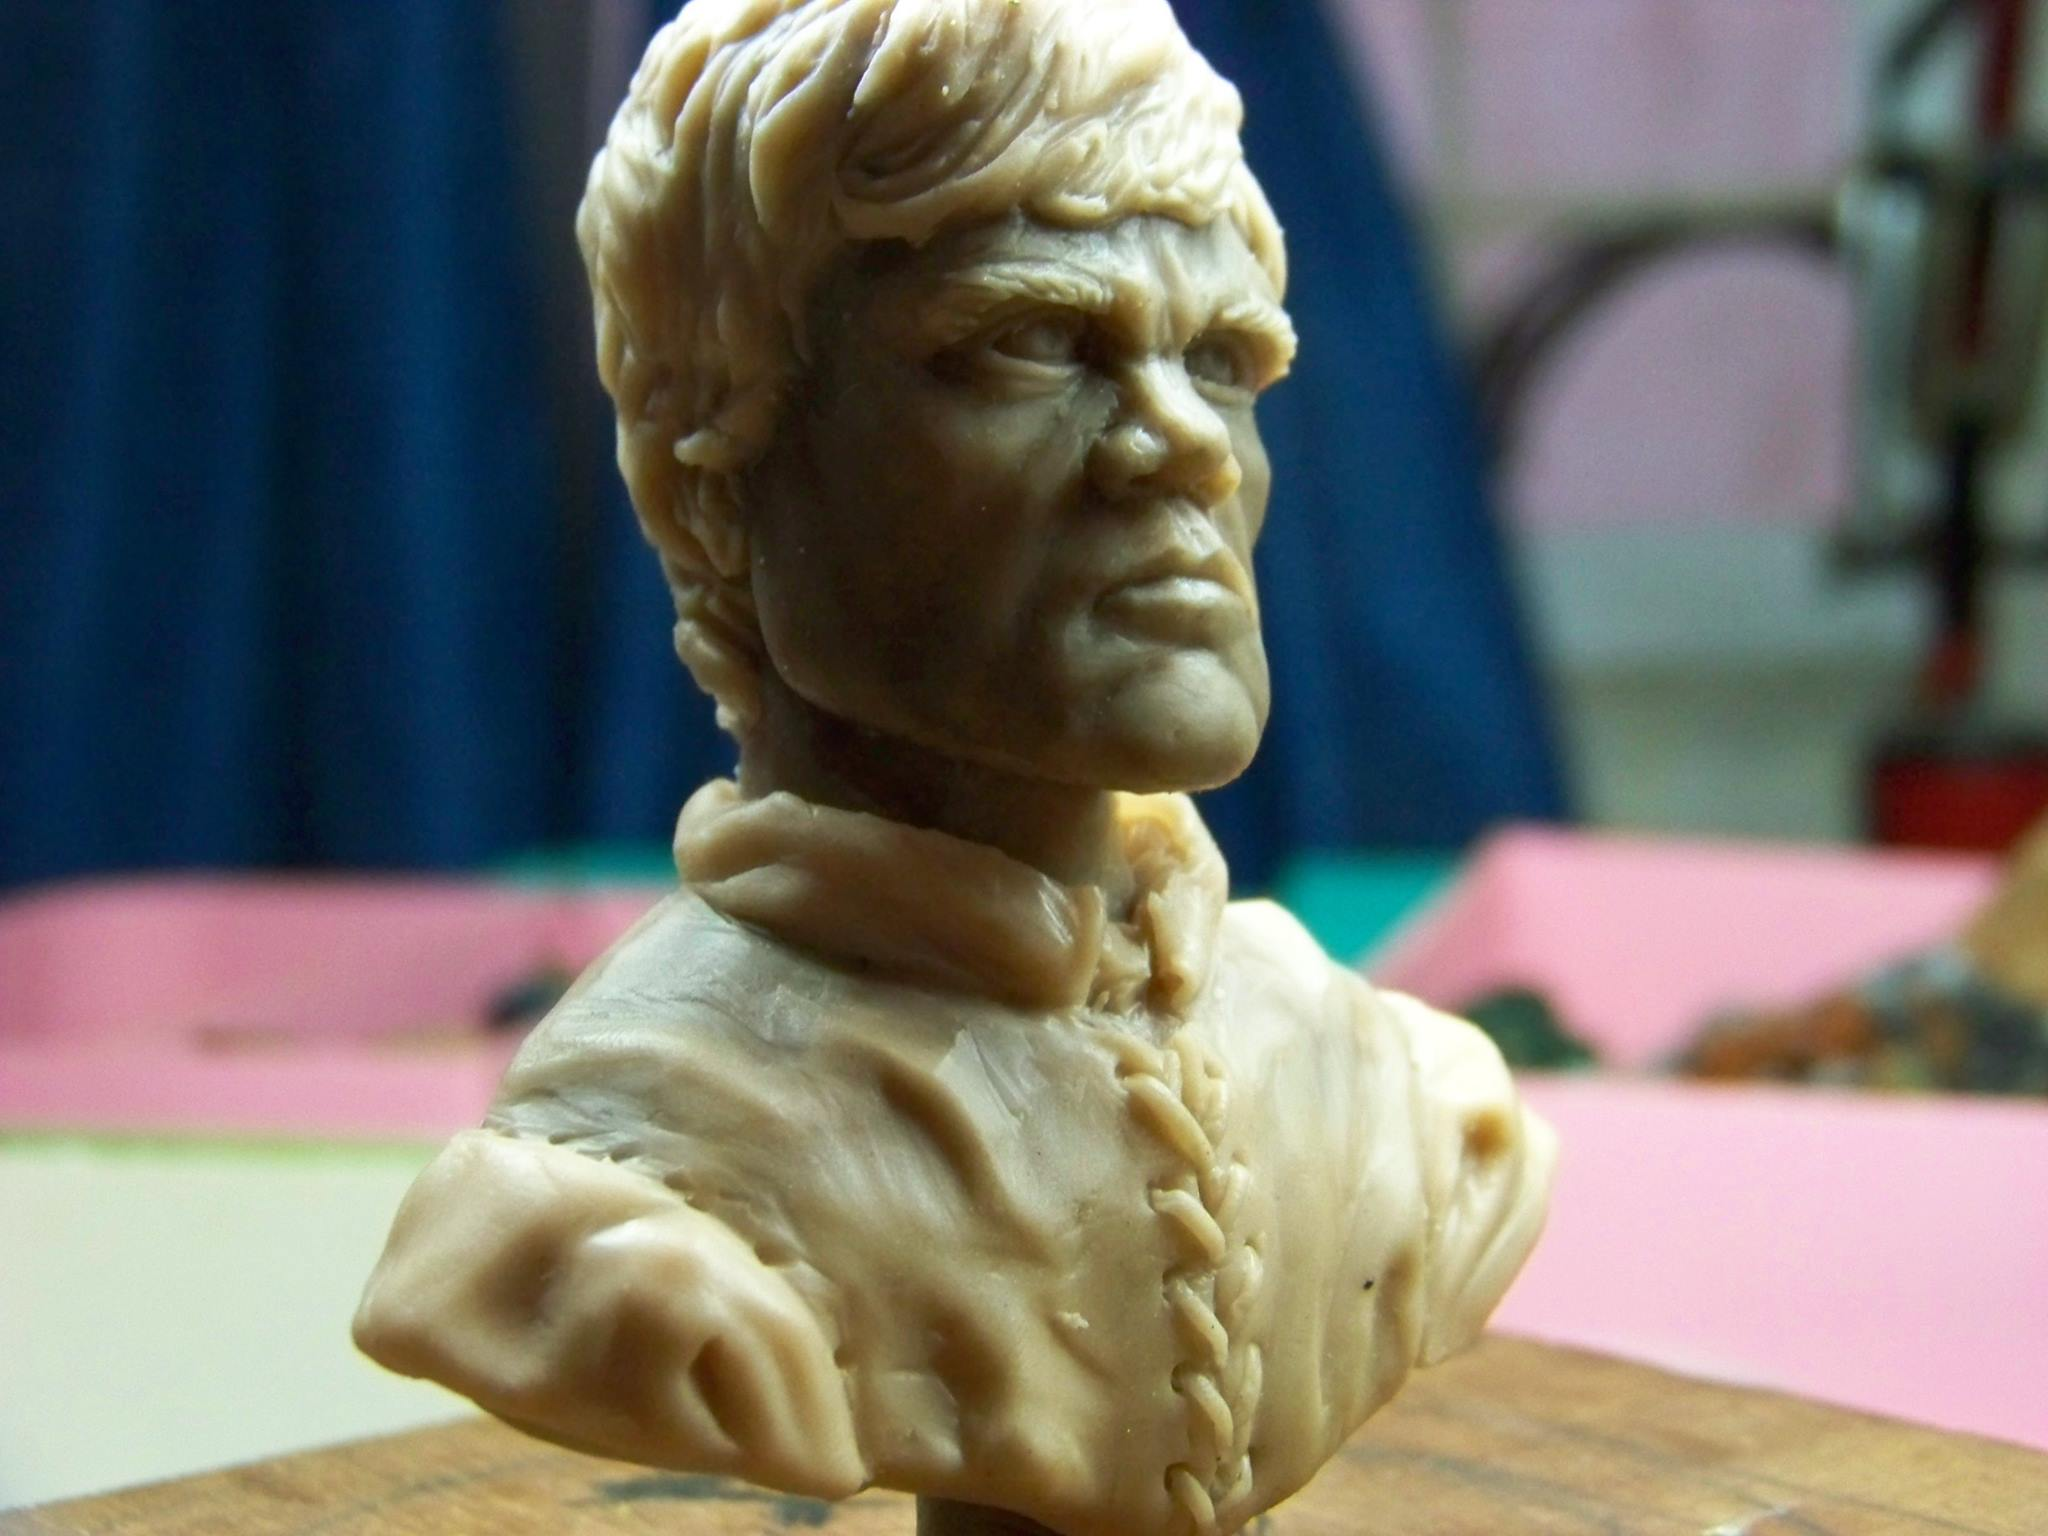 Busto de Tyrion Lannister por Isaac Gutierres de Dwarf's Forge Miniatures